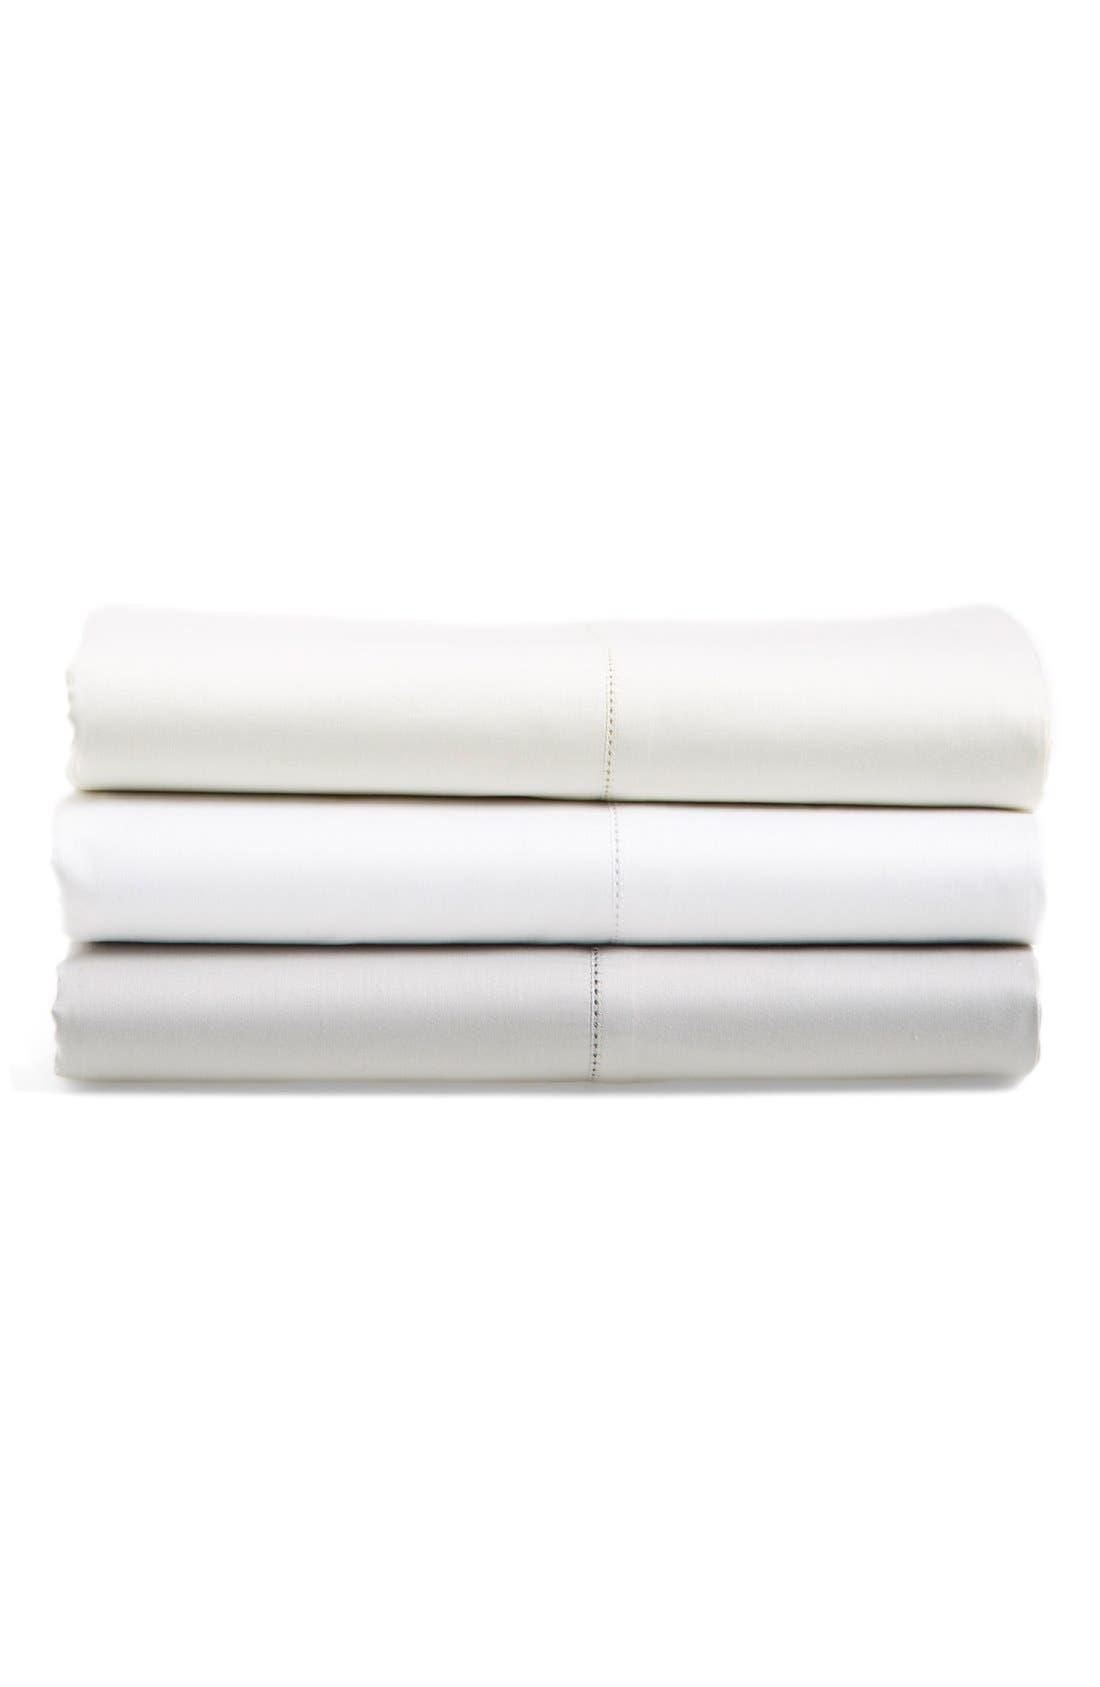 600 Thread Count Egyptian Cotton Single Sheets,                             Alternate thumbnail 3, color,                             020